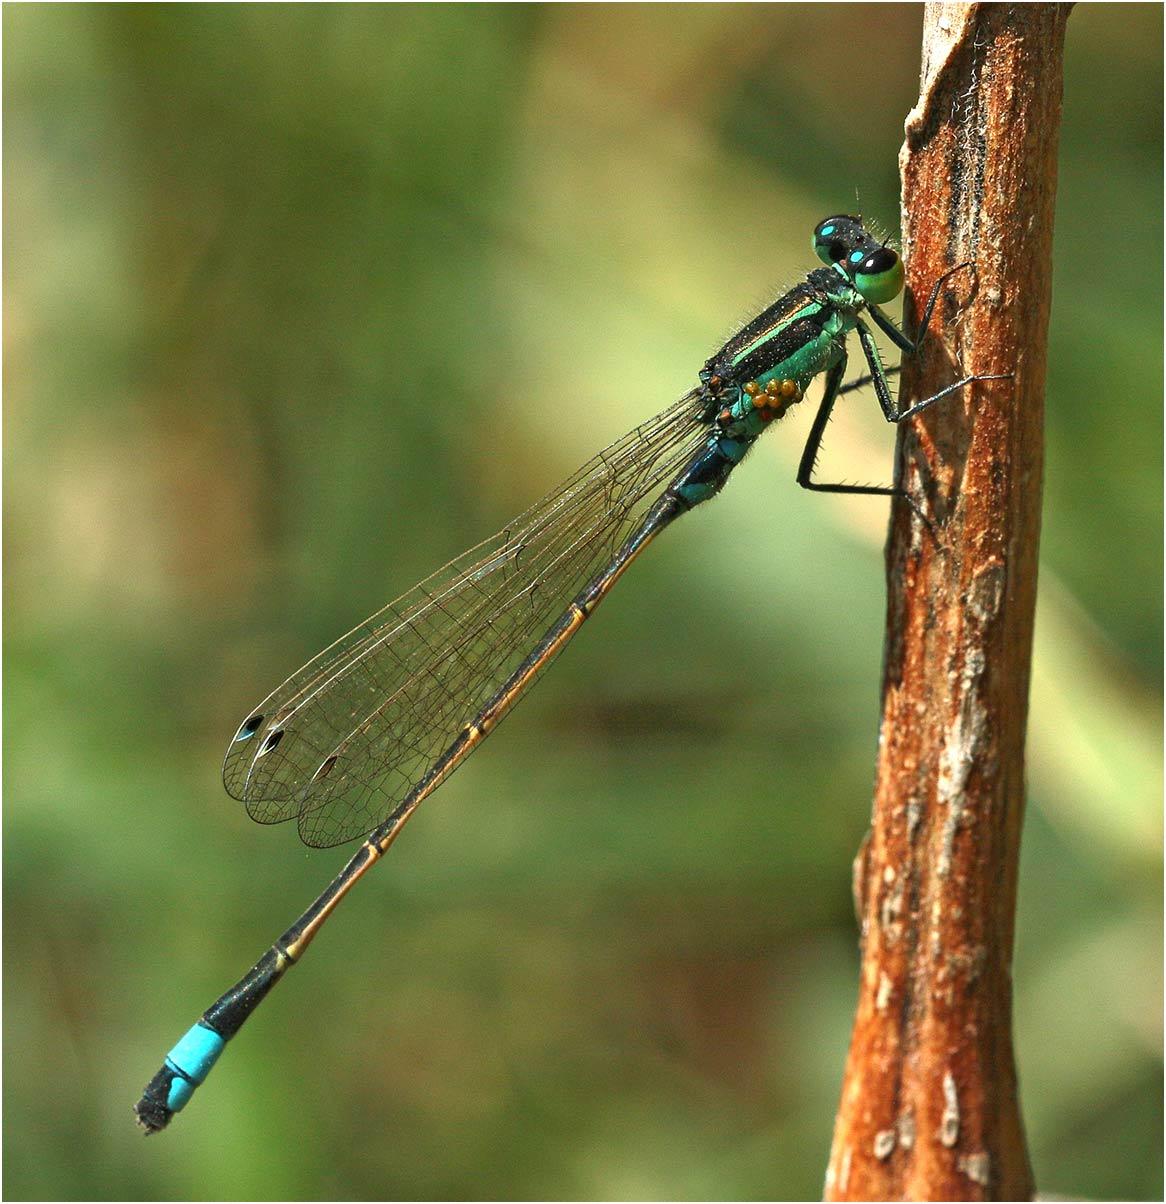 Ischnura senegalensis mâle, Ethiopie, Lac Awasa, 31/10/2018